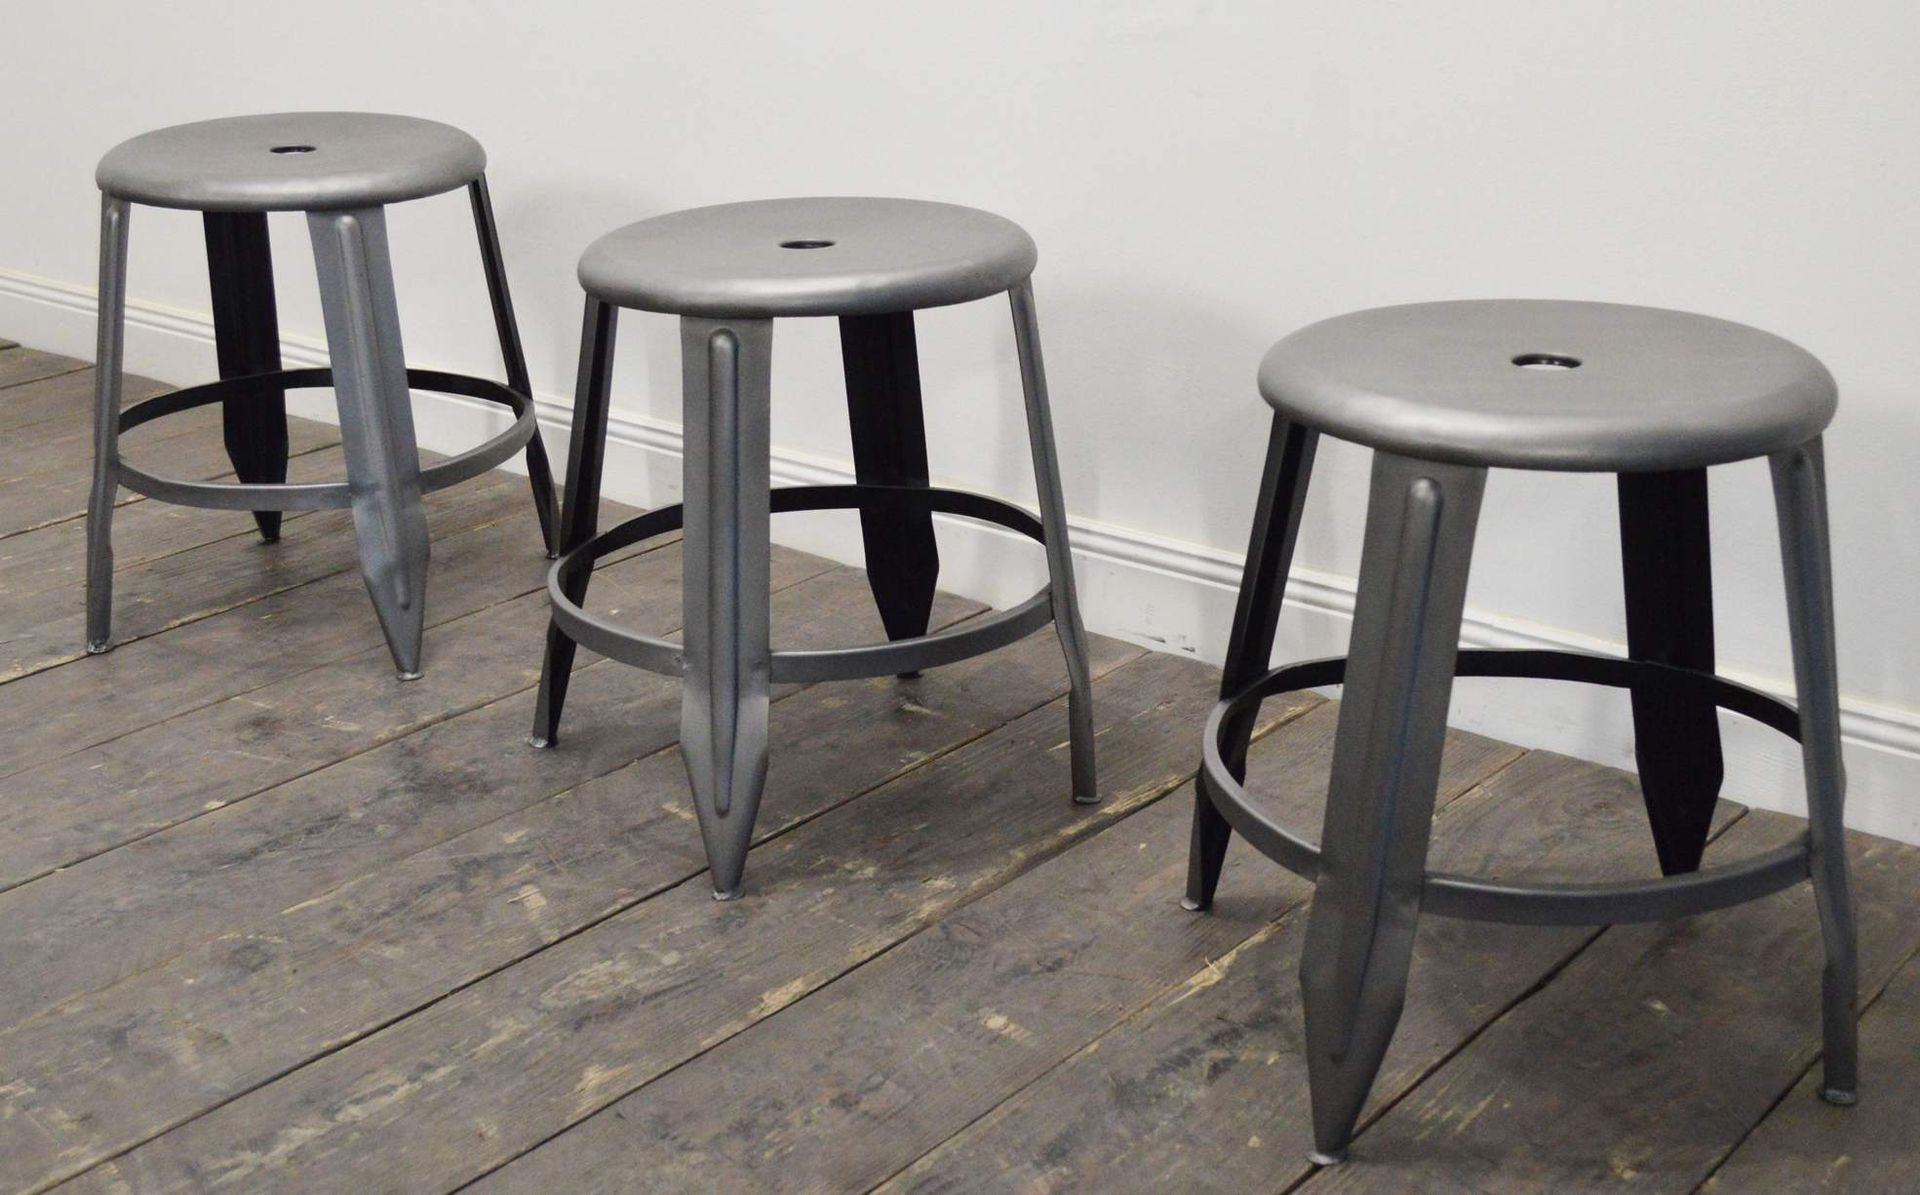 industrieller metall hocker bei pamono kaufen. Black Bedroom Furniture Sets. Home Design Ideas